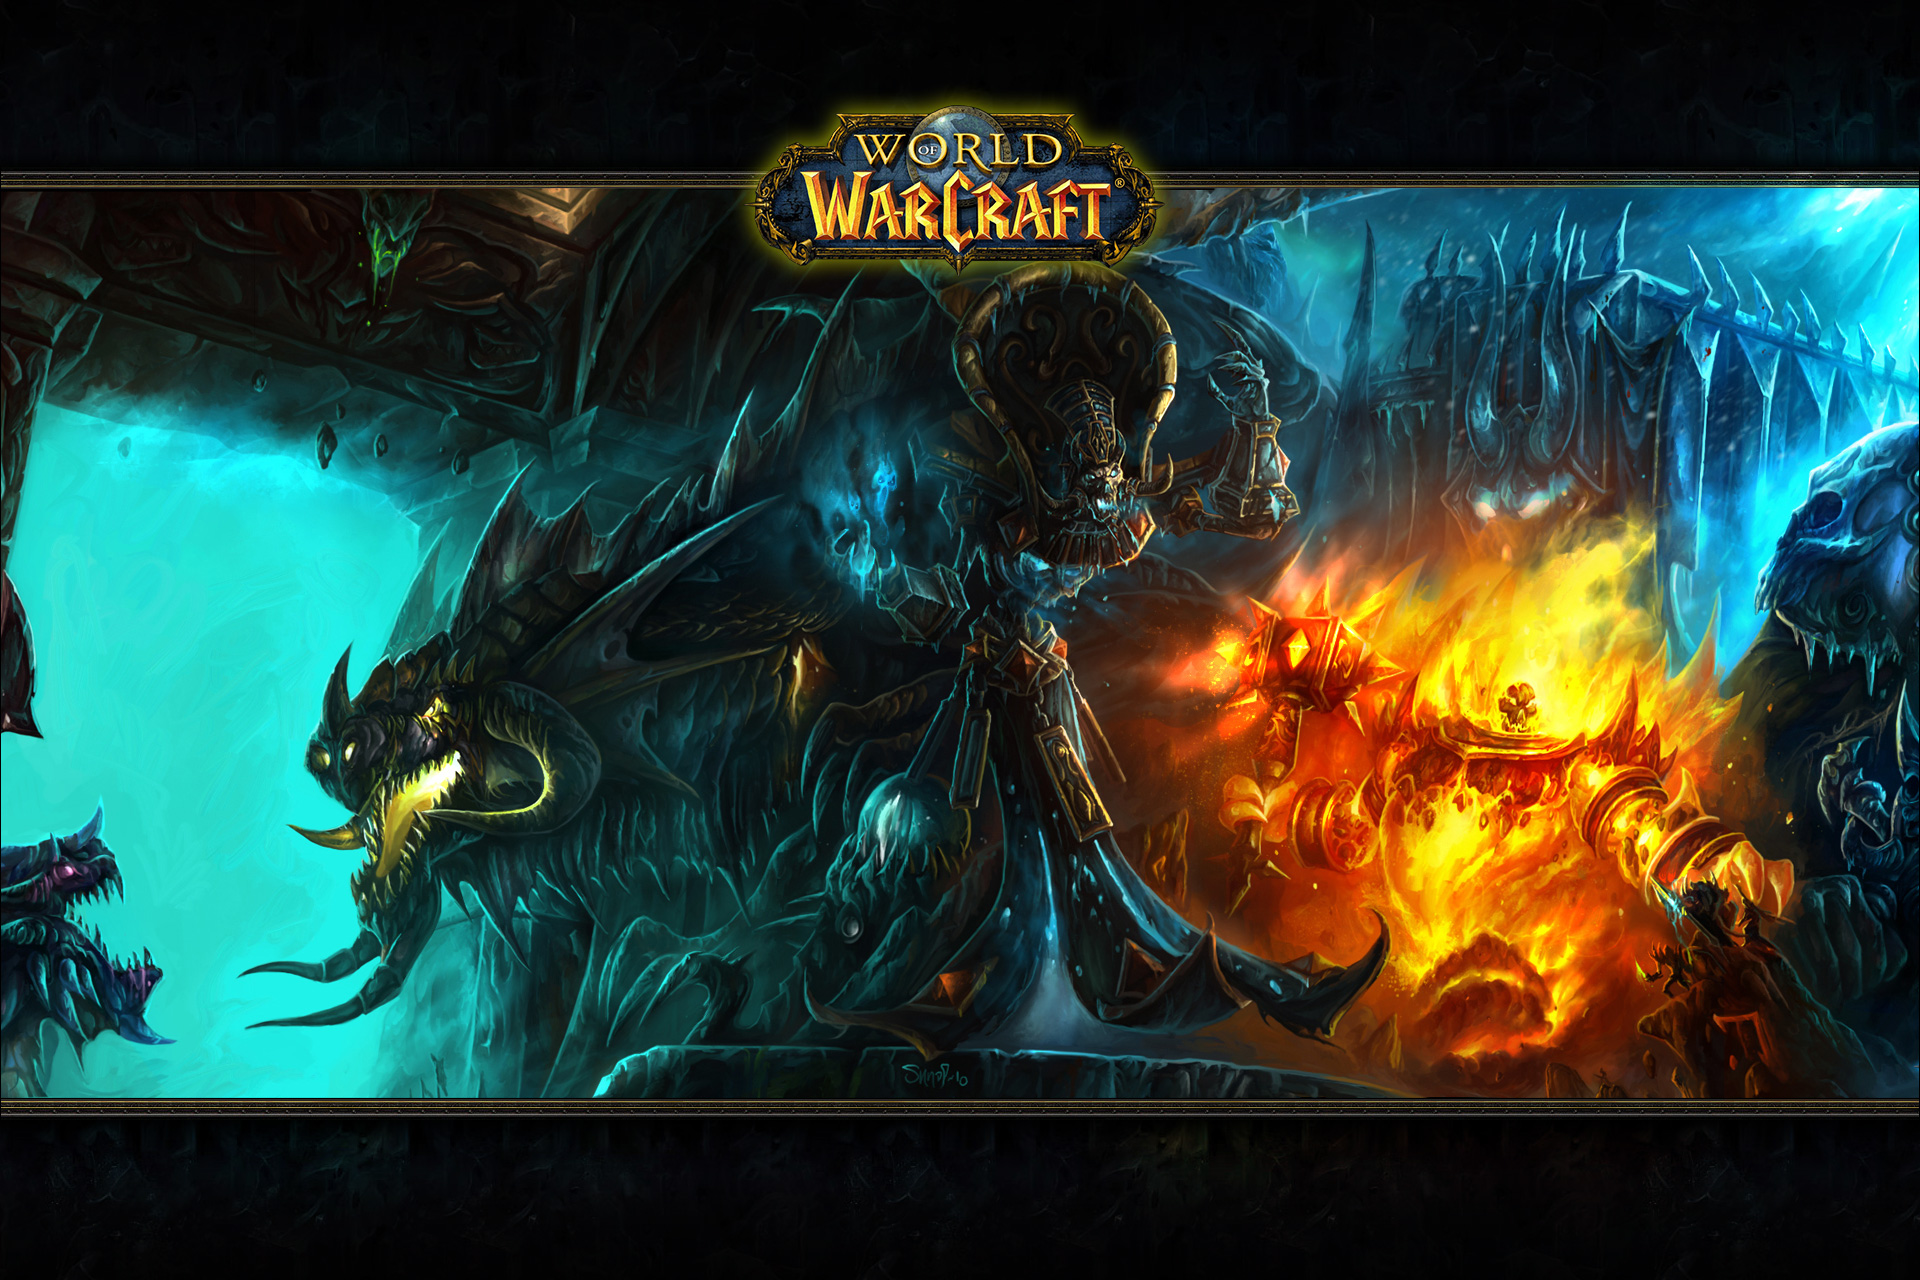 World of Warcraft wallpaper 30